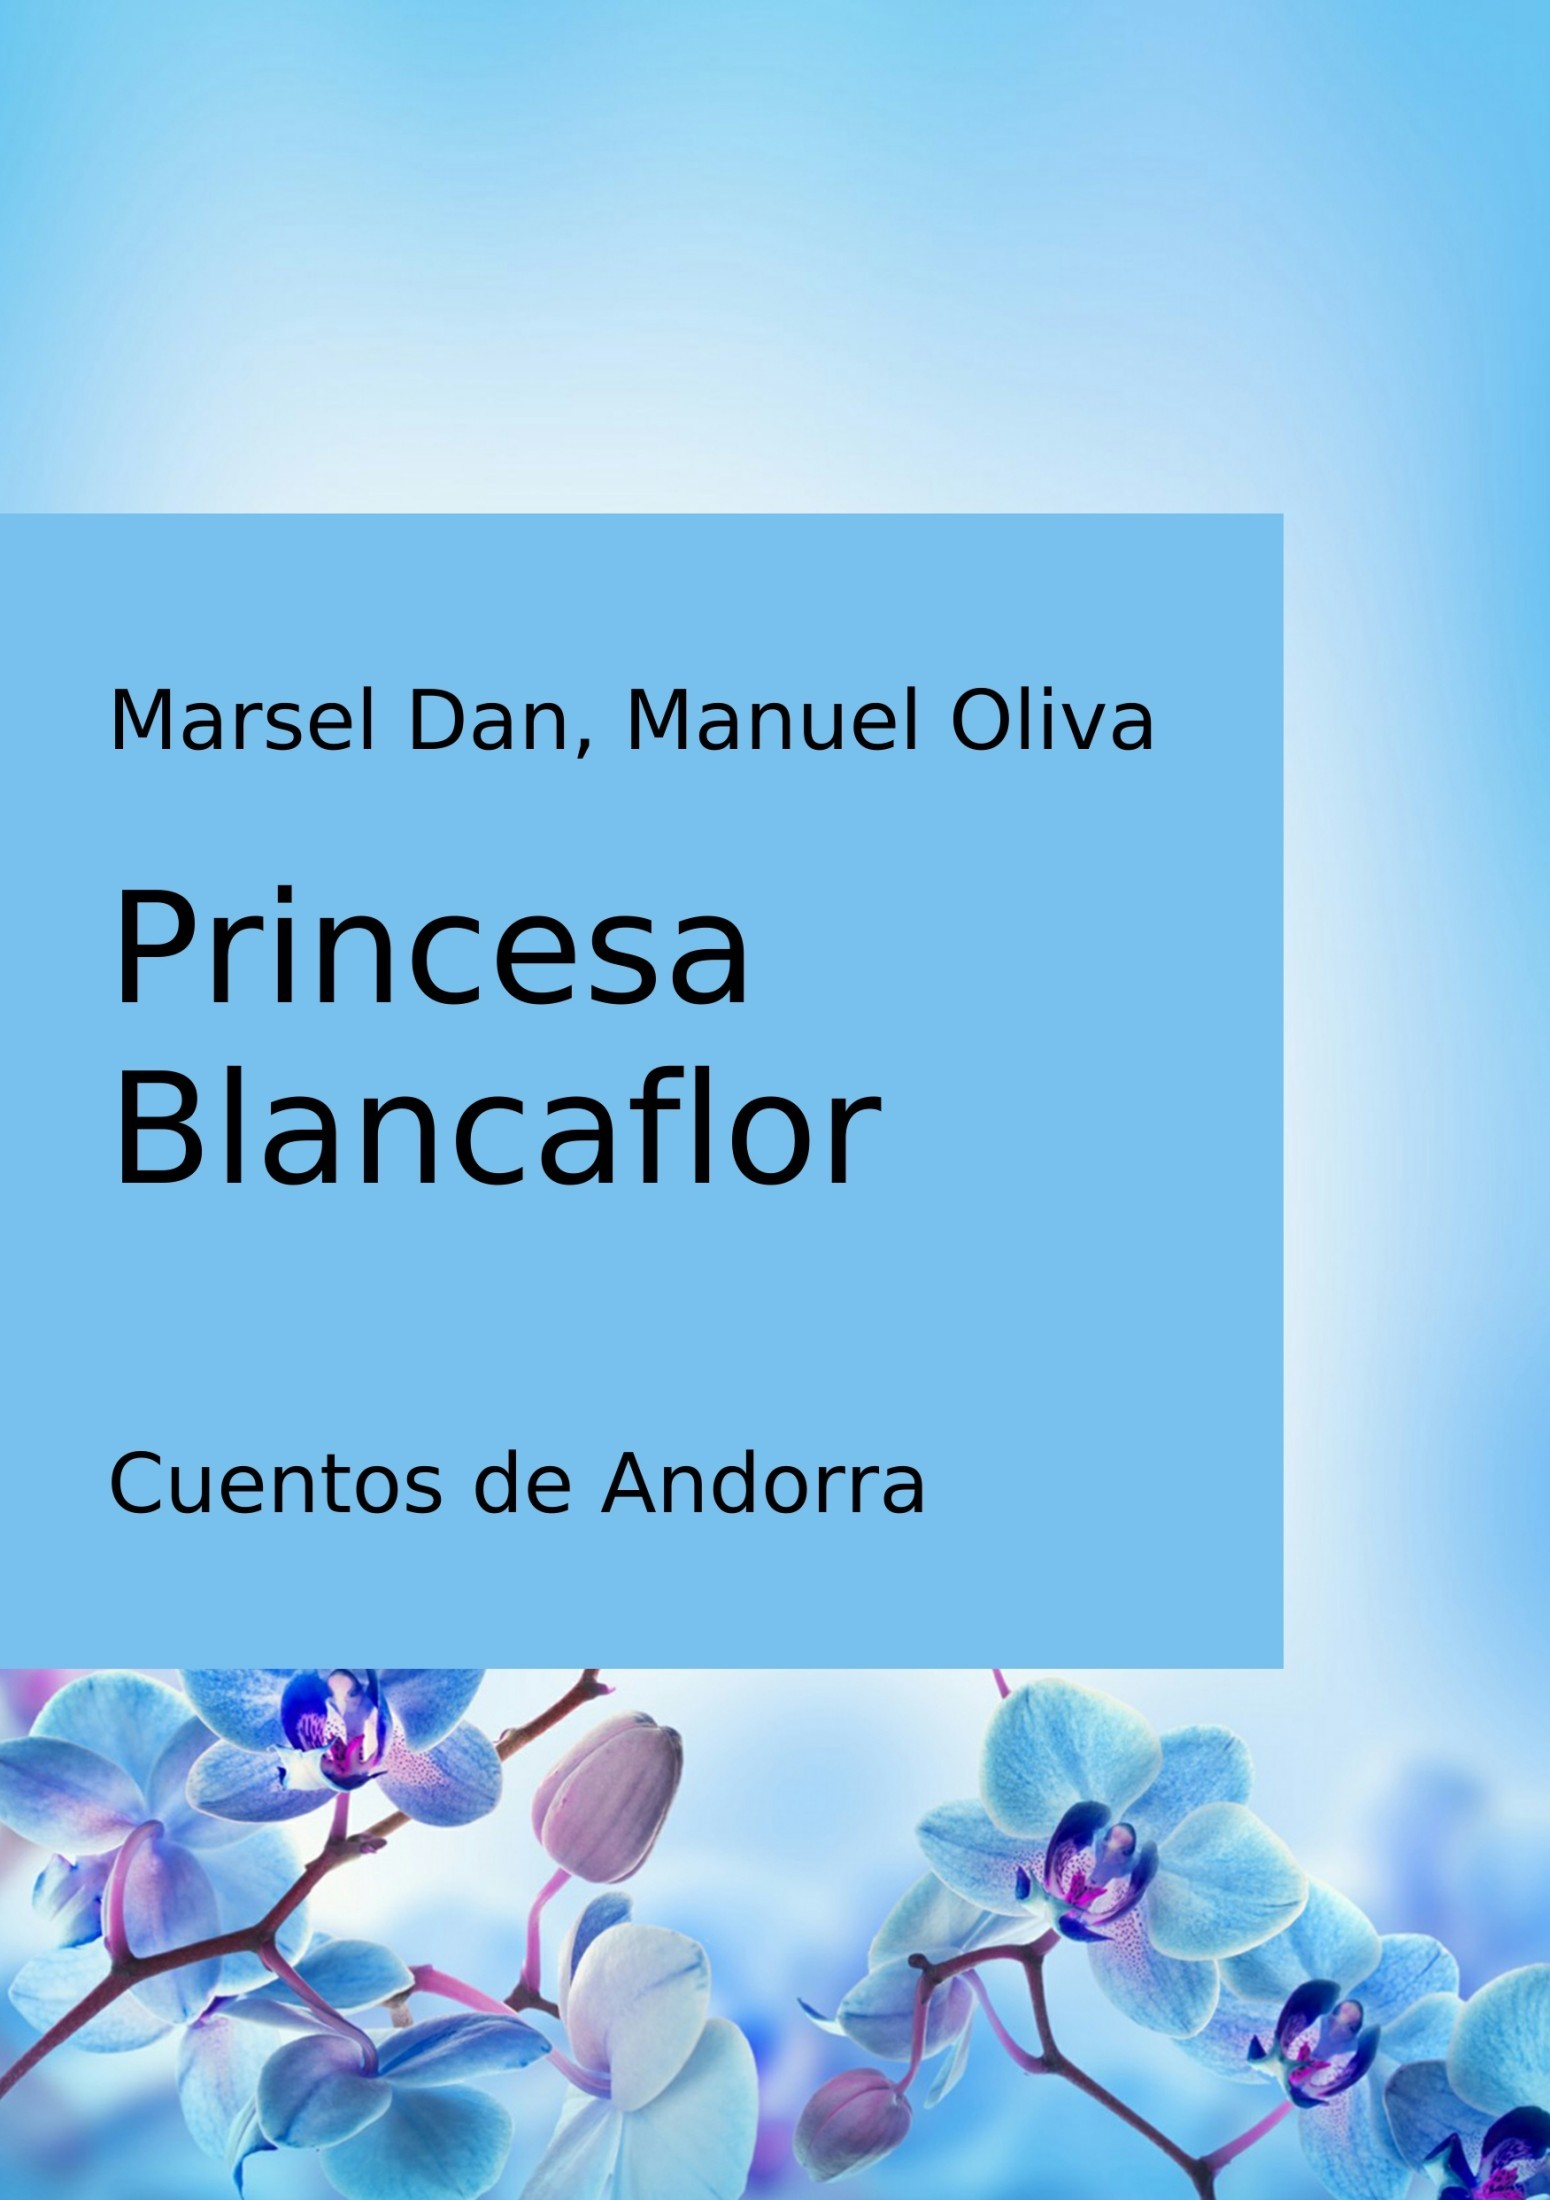 Marsel Dan Princesa Blancaflor